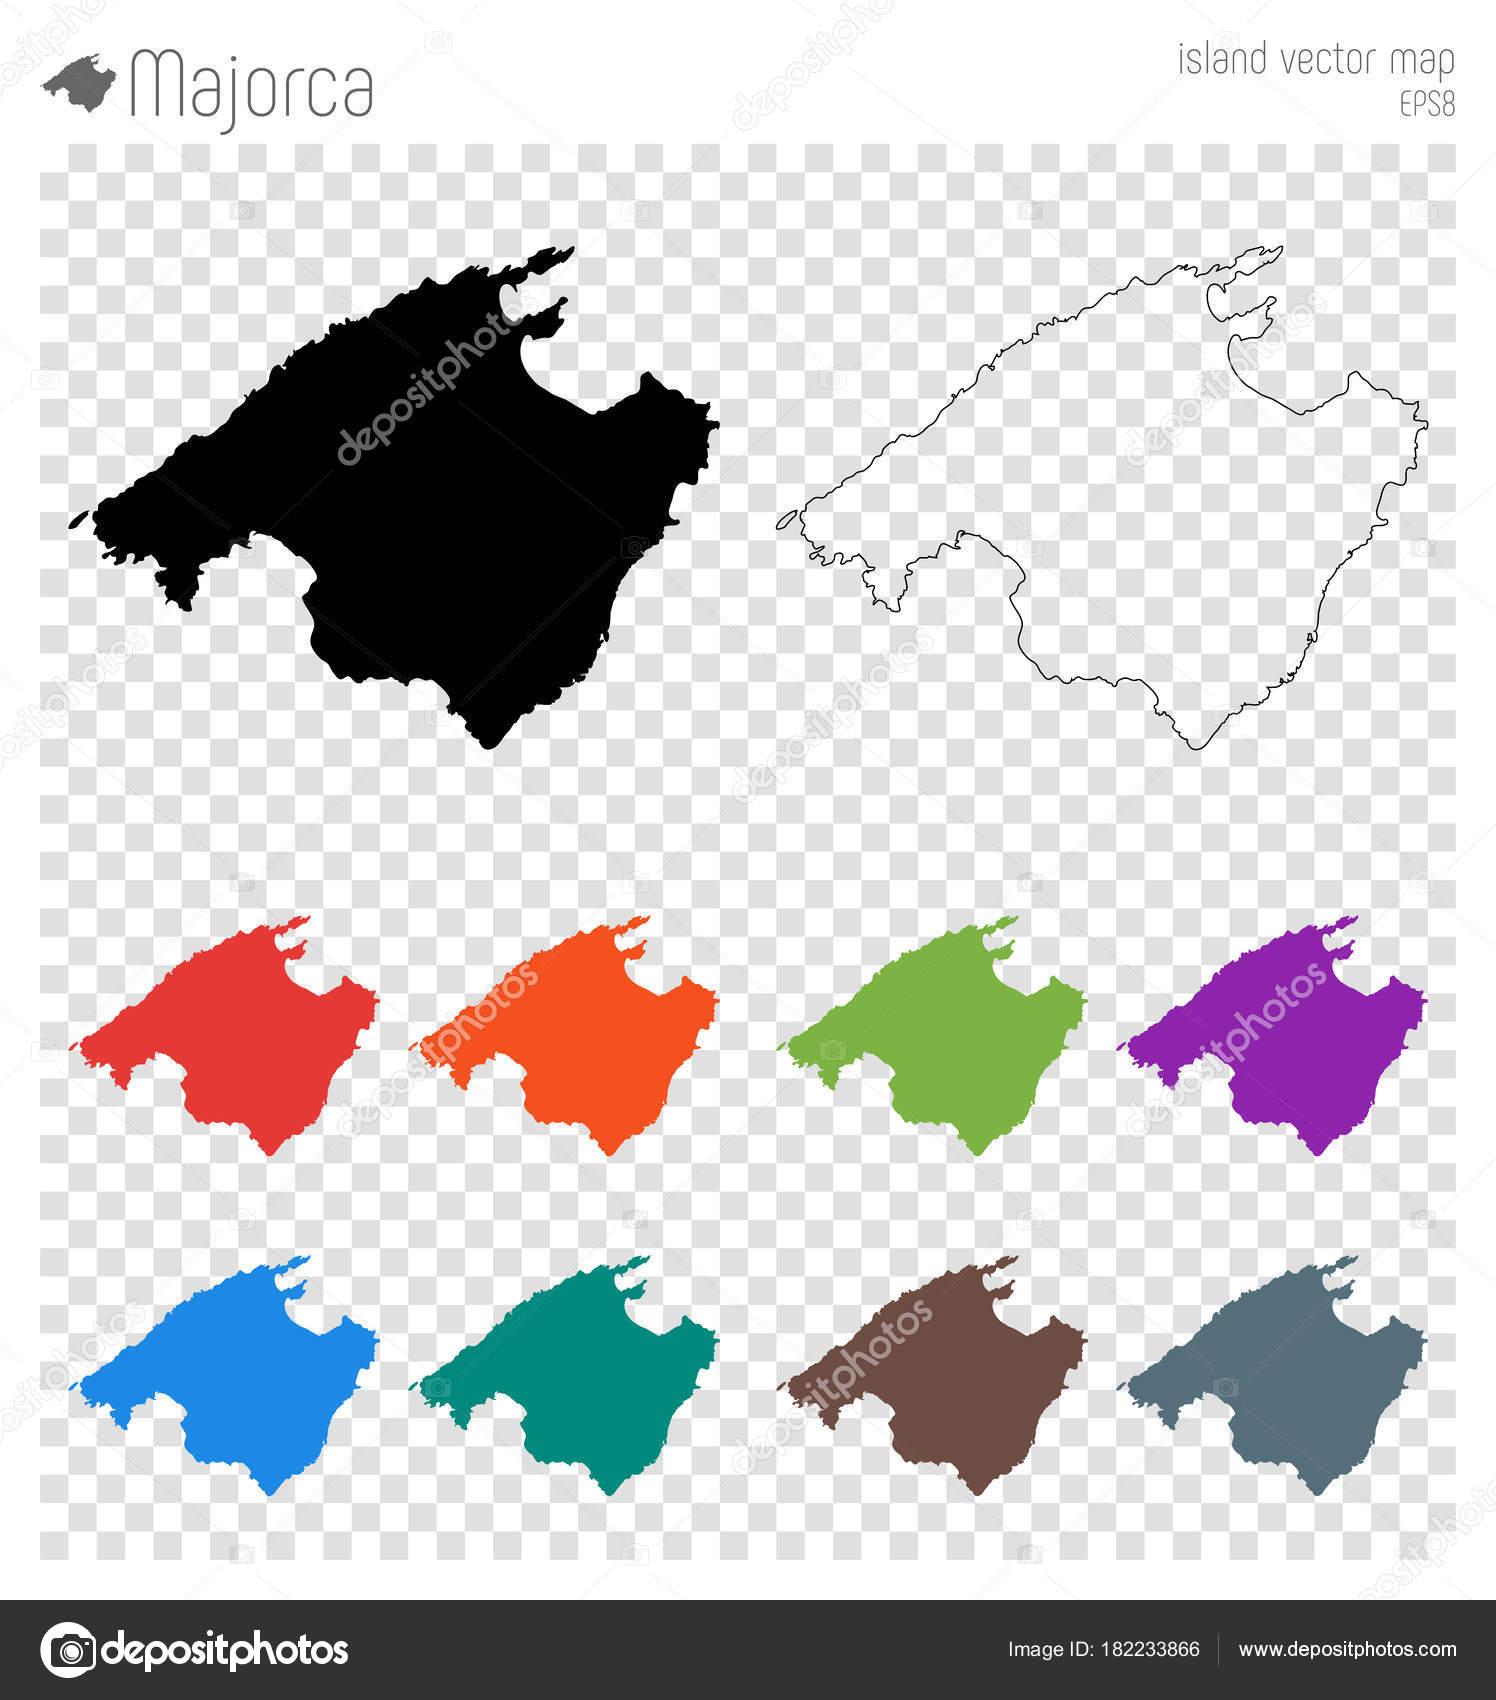 Mallorca Karte Umriss.Mallorca Hoch Detaillierte Karte Insel Silhouette Symbol